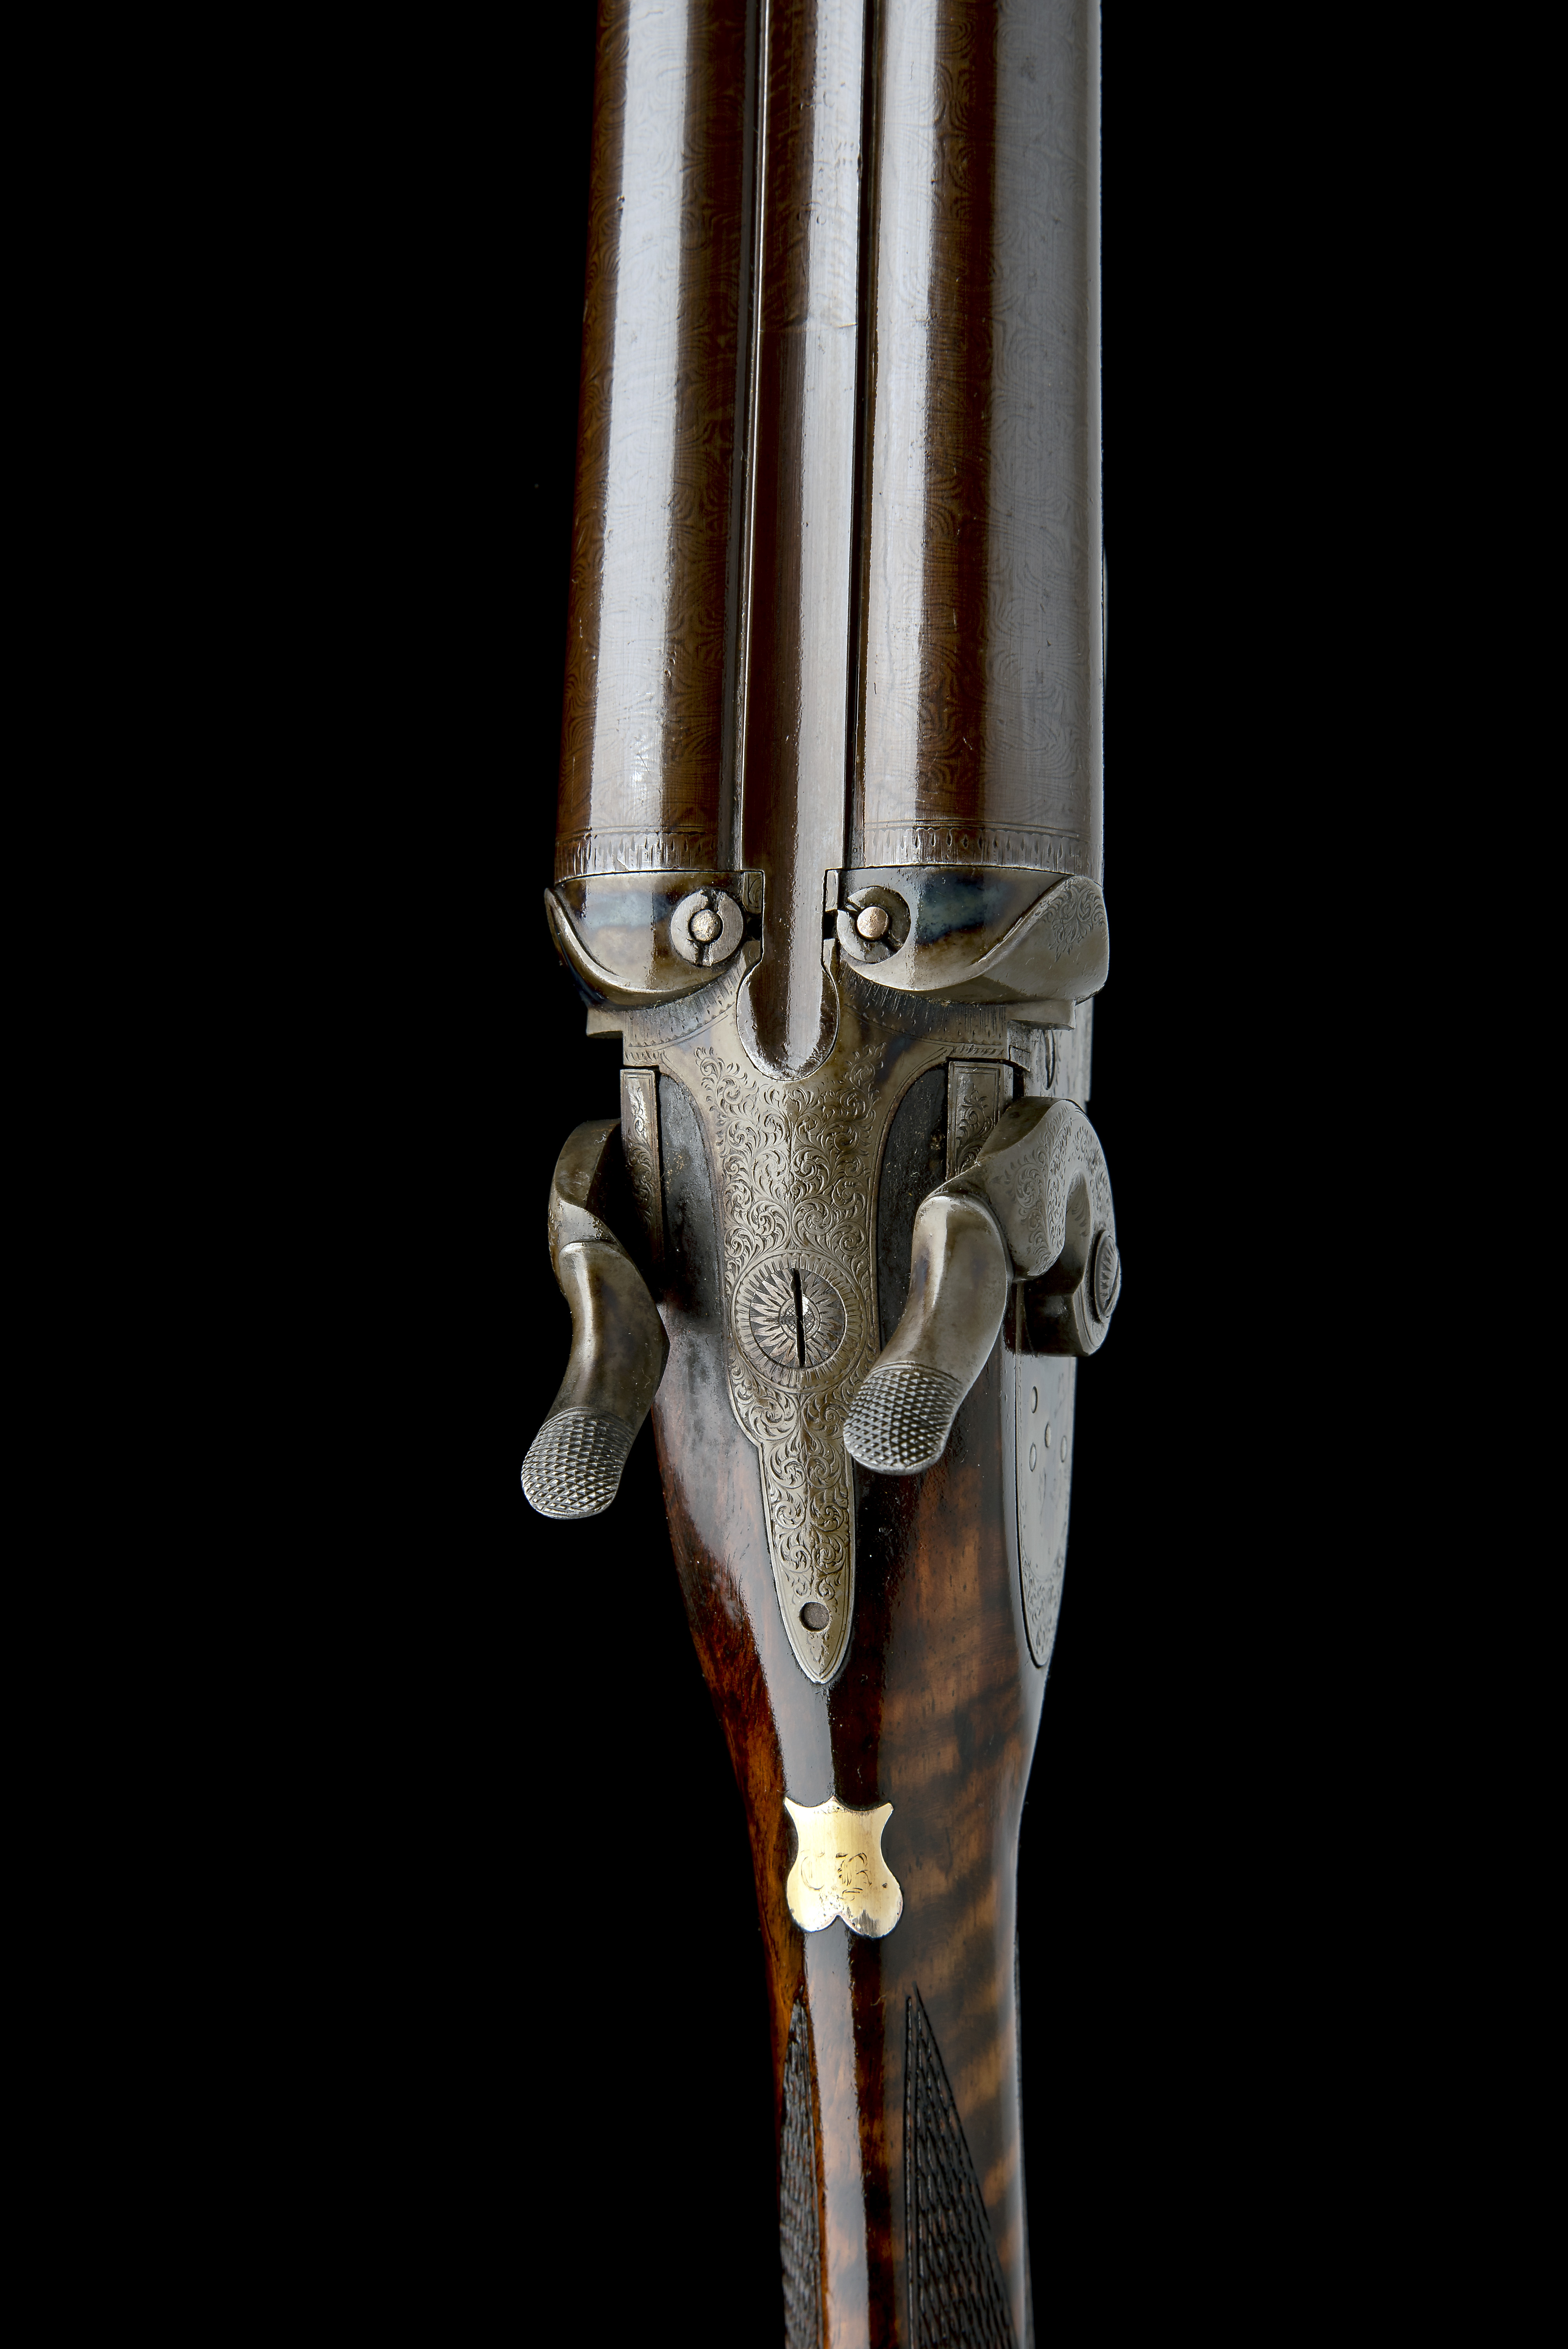 JOHN HANSON A SCARCE 12-BORE 1868 PATENT SLIDING GUARD HAMMERGUN, serial no. 731, circa 1870, - Image 4 of 9